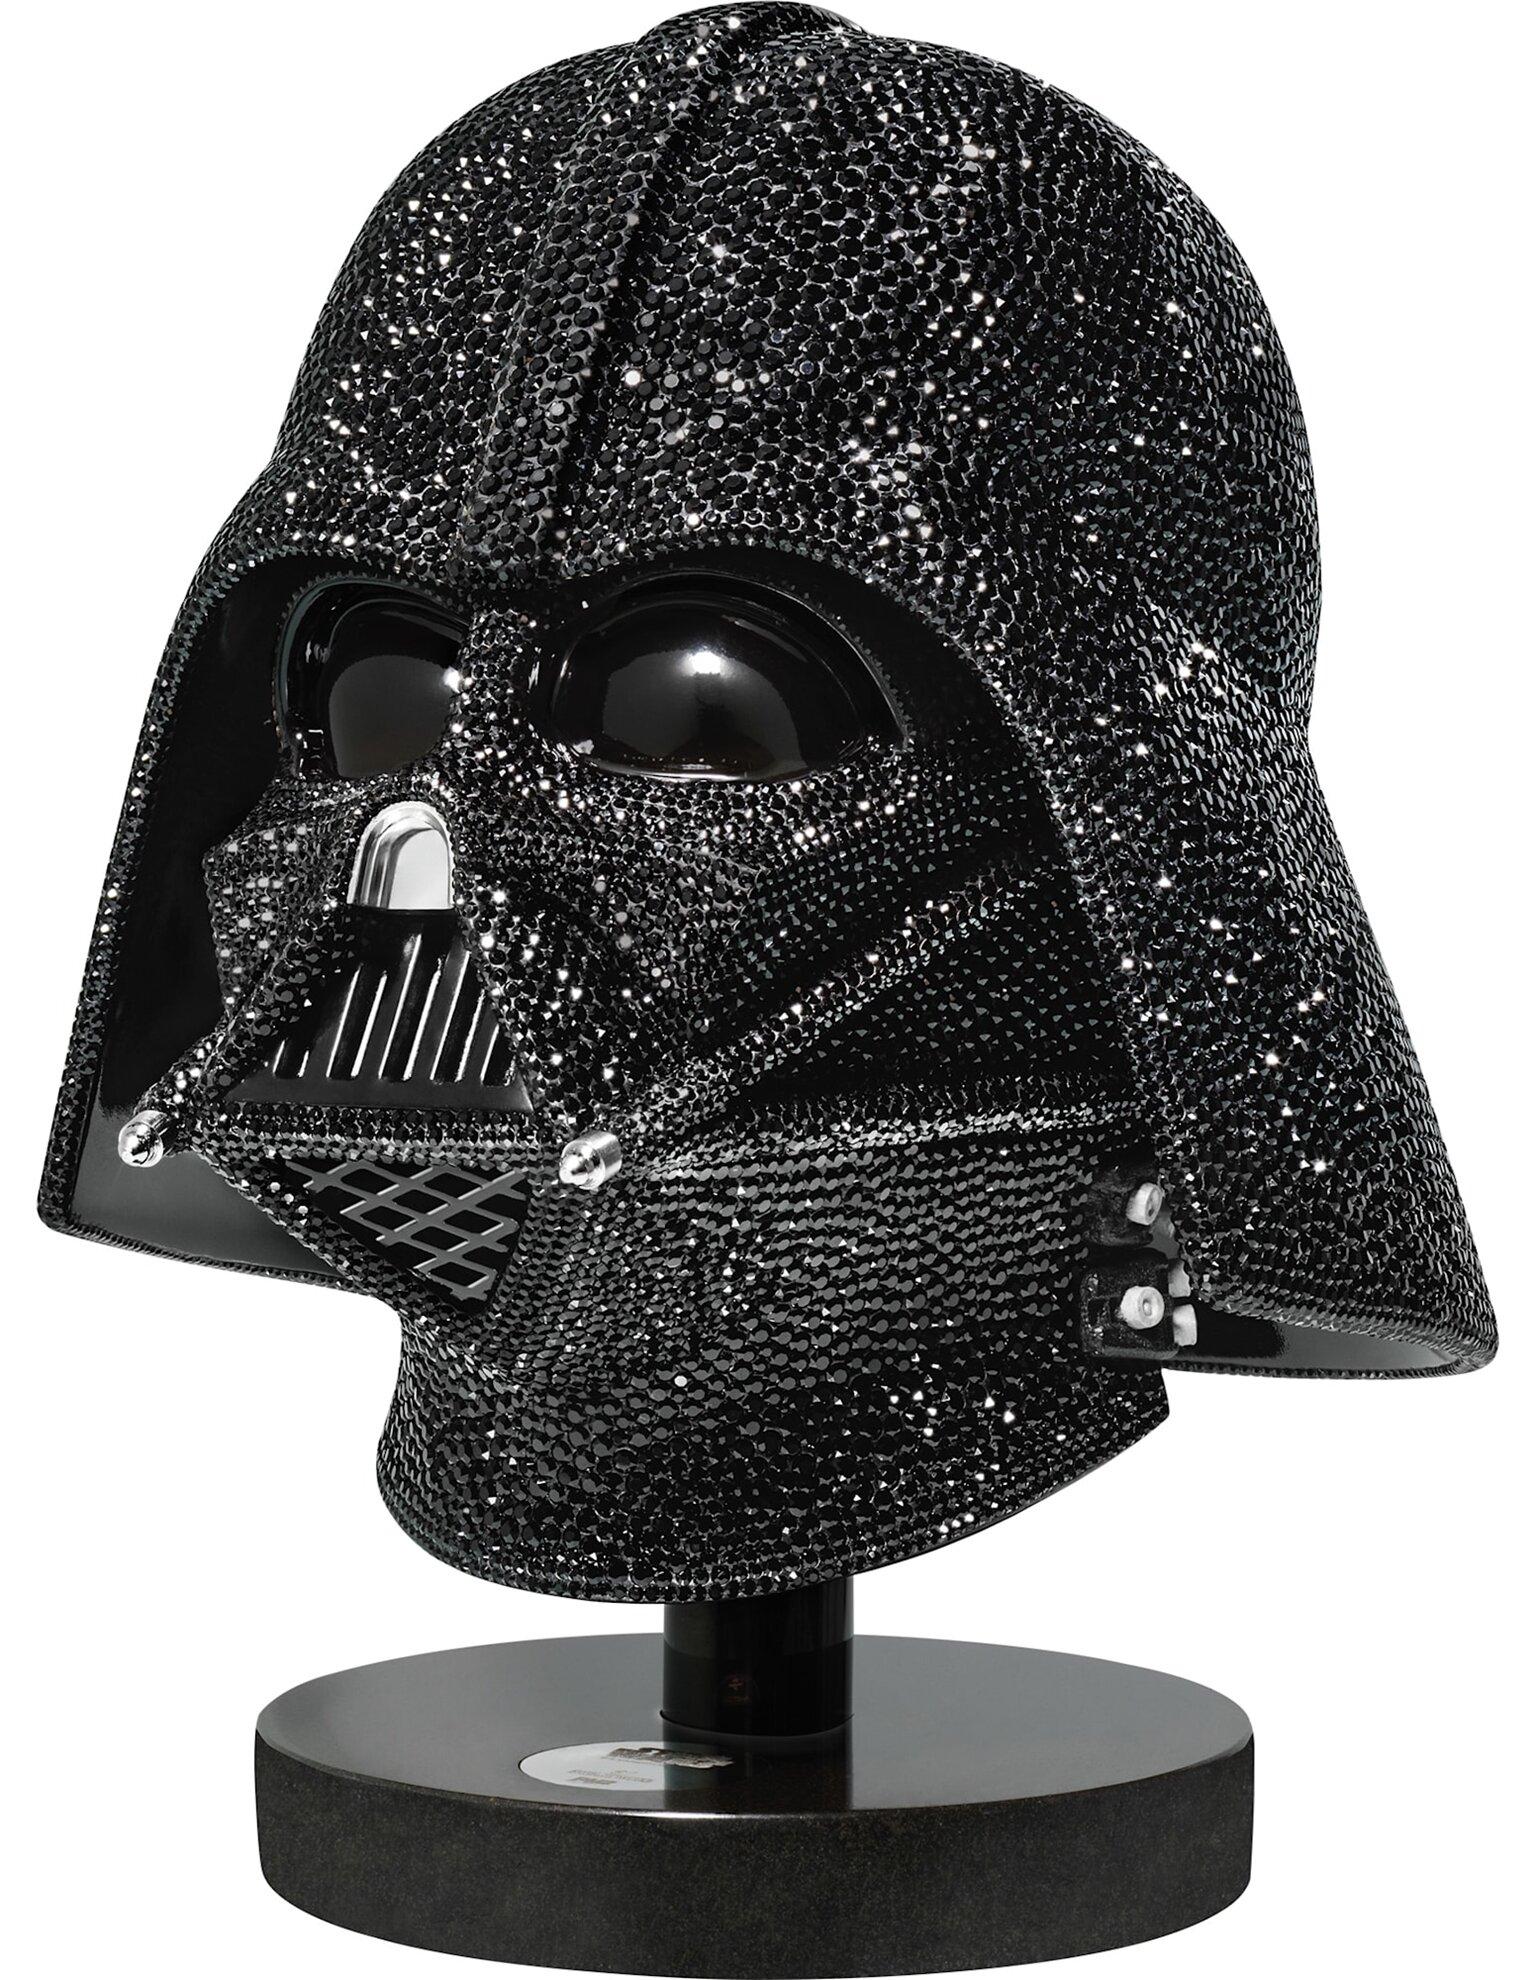 Picture of Star Wars – Darth Vader Kaskı, Sınırlı Üretim